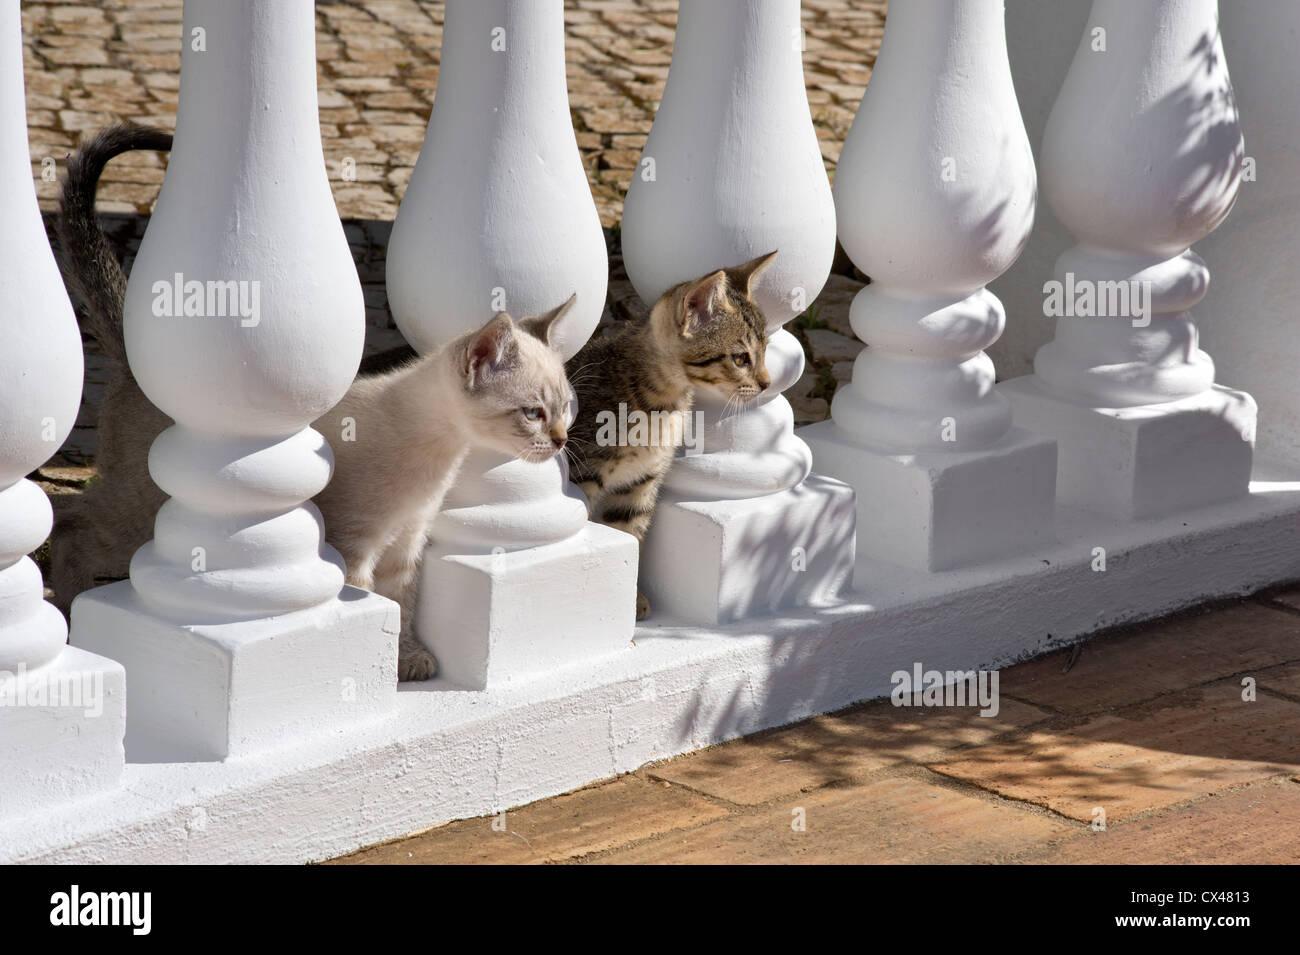 Zwei Kätzchen peeping durch Balustraden in Portugal, Algarve Stockbild